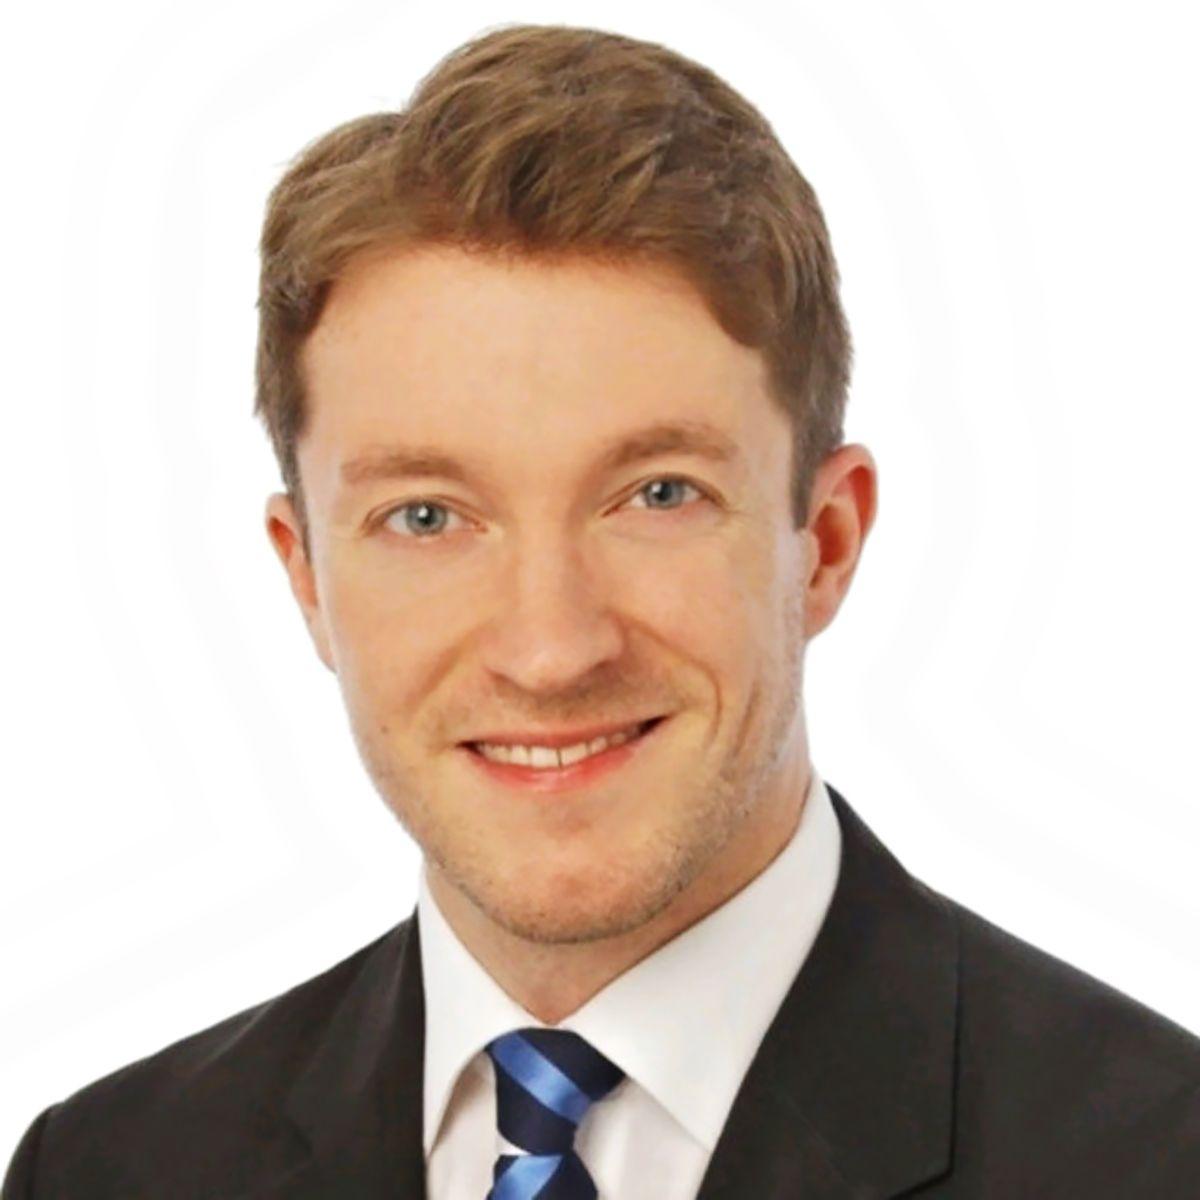 Andreas Stadelbauer